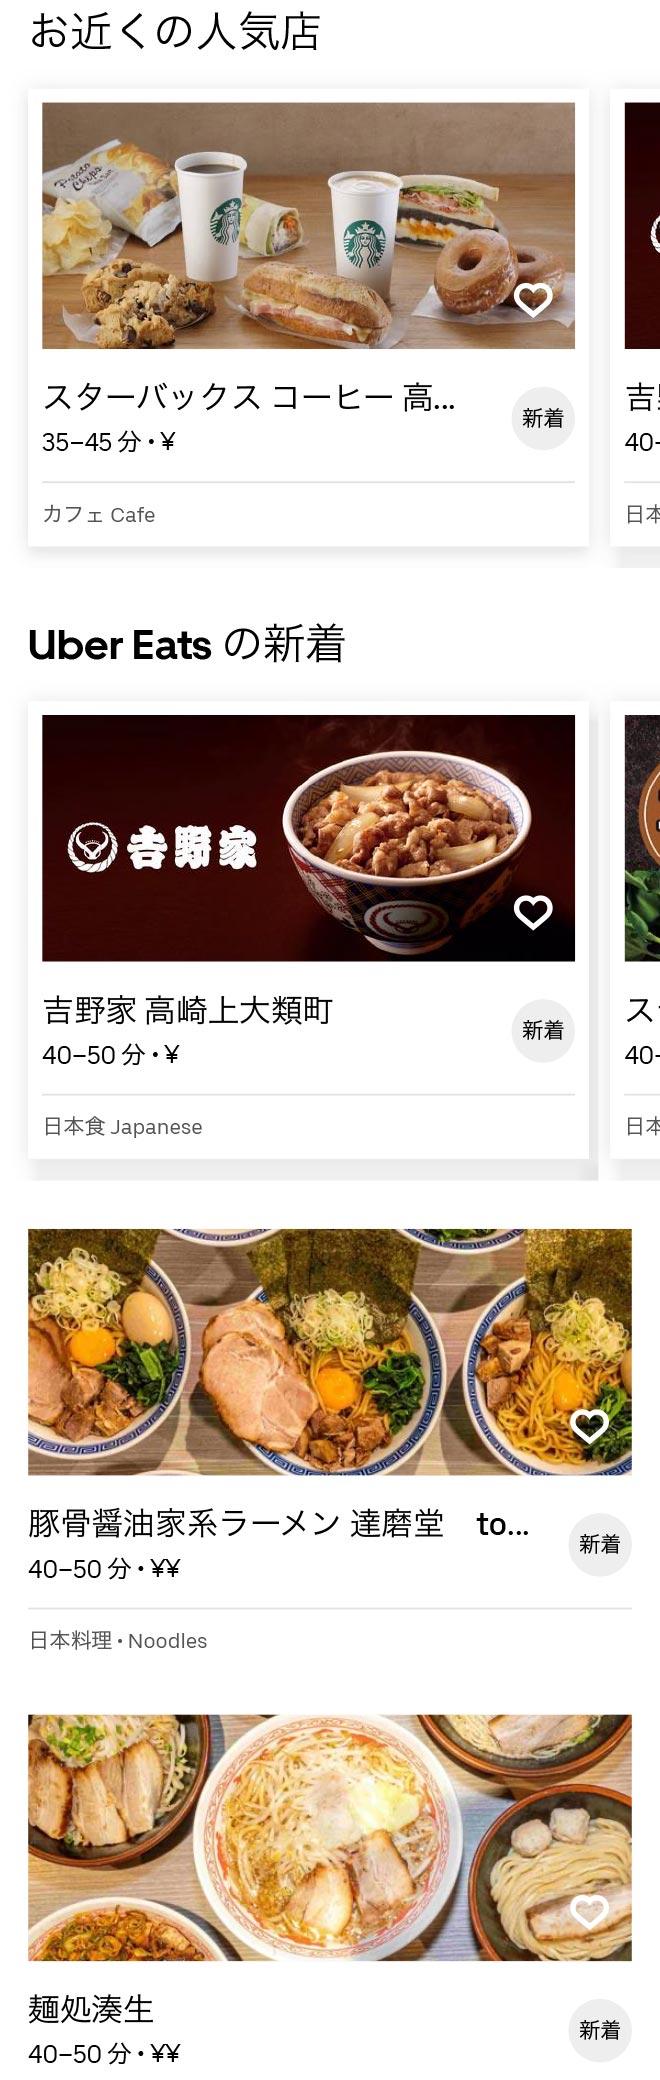 Takasaki menu 2009 1